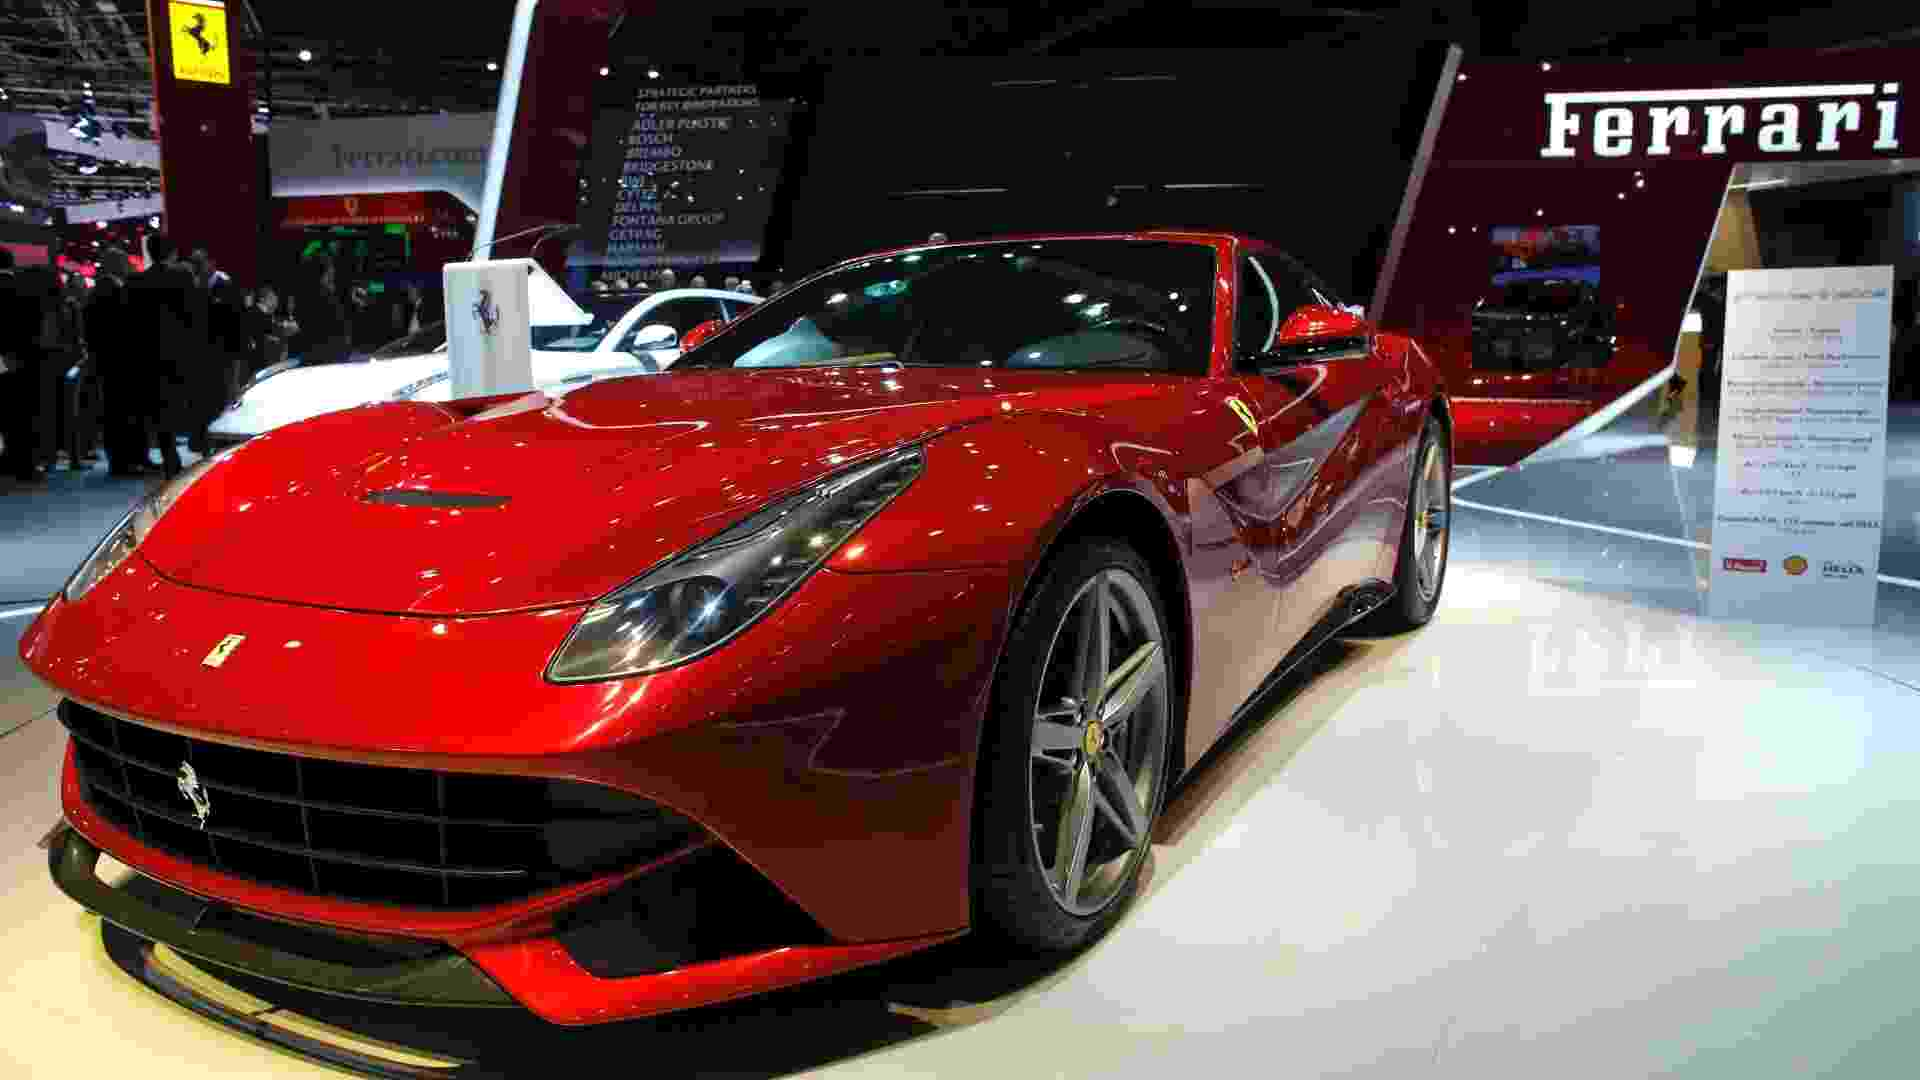 Ferrari F12 Berlinetta - Christian Hartmann/Reuters